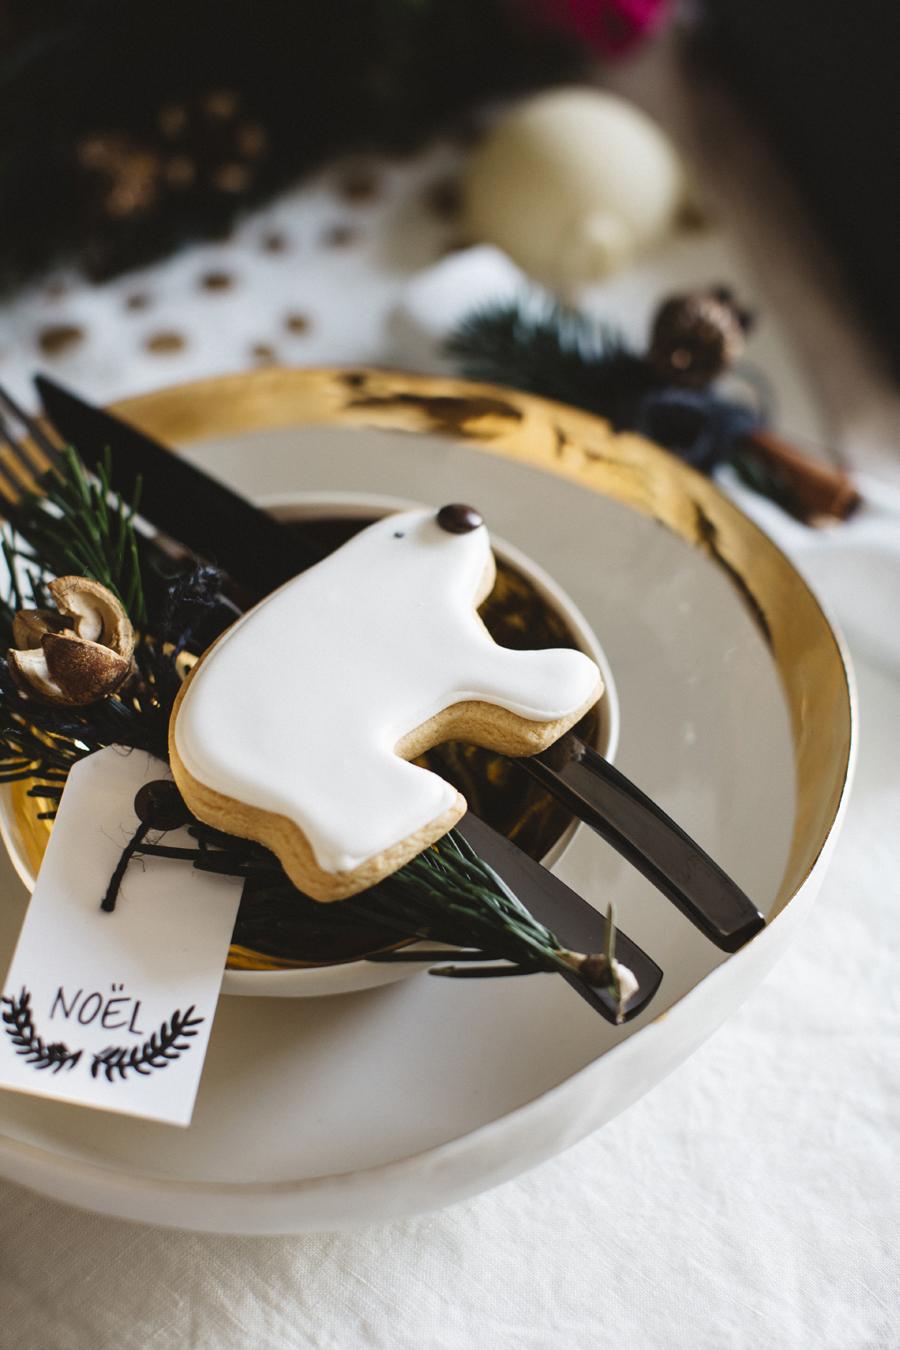 table_de_noel_food_la_grande_epicerie_le_bon_marche_19